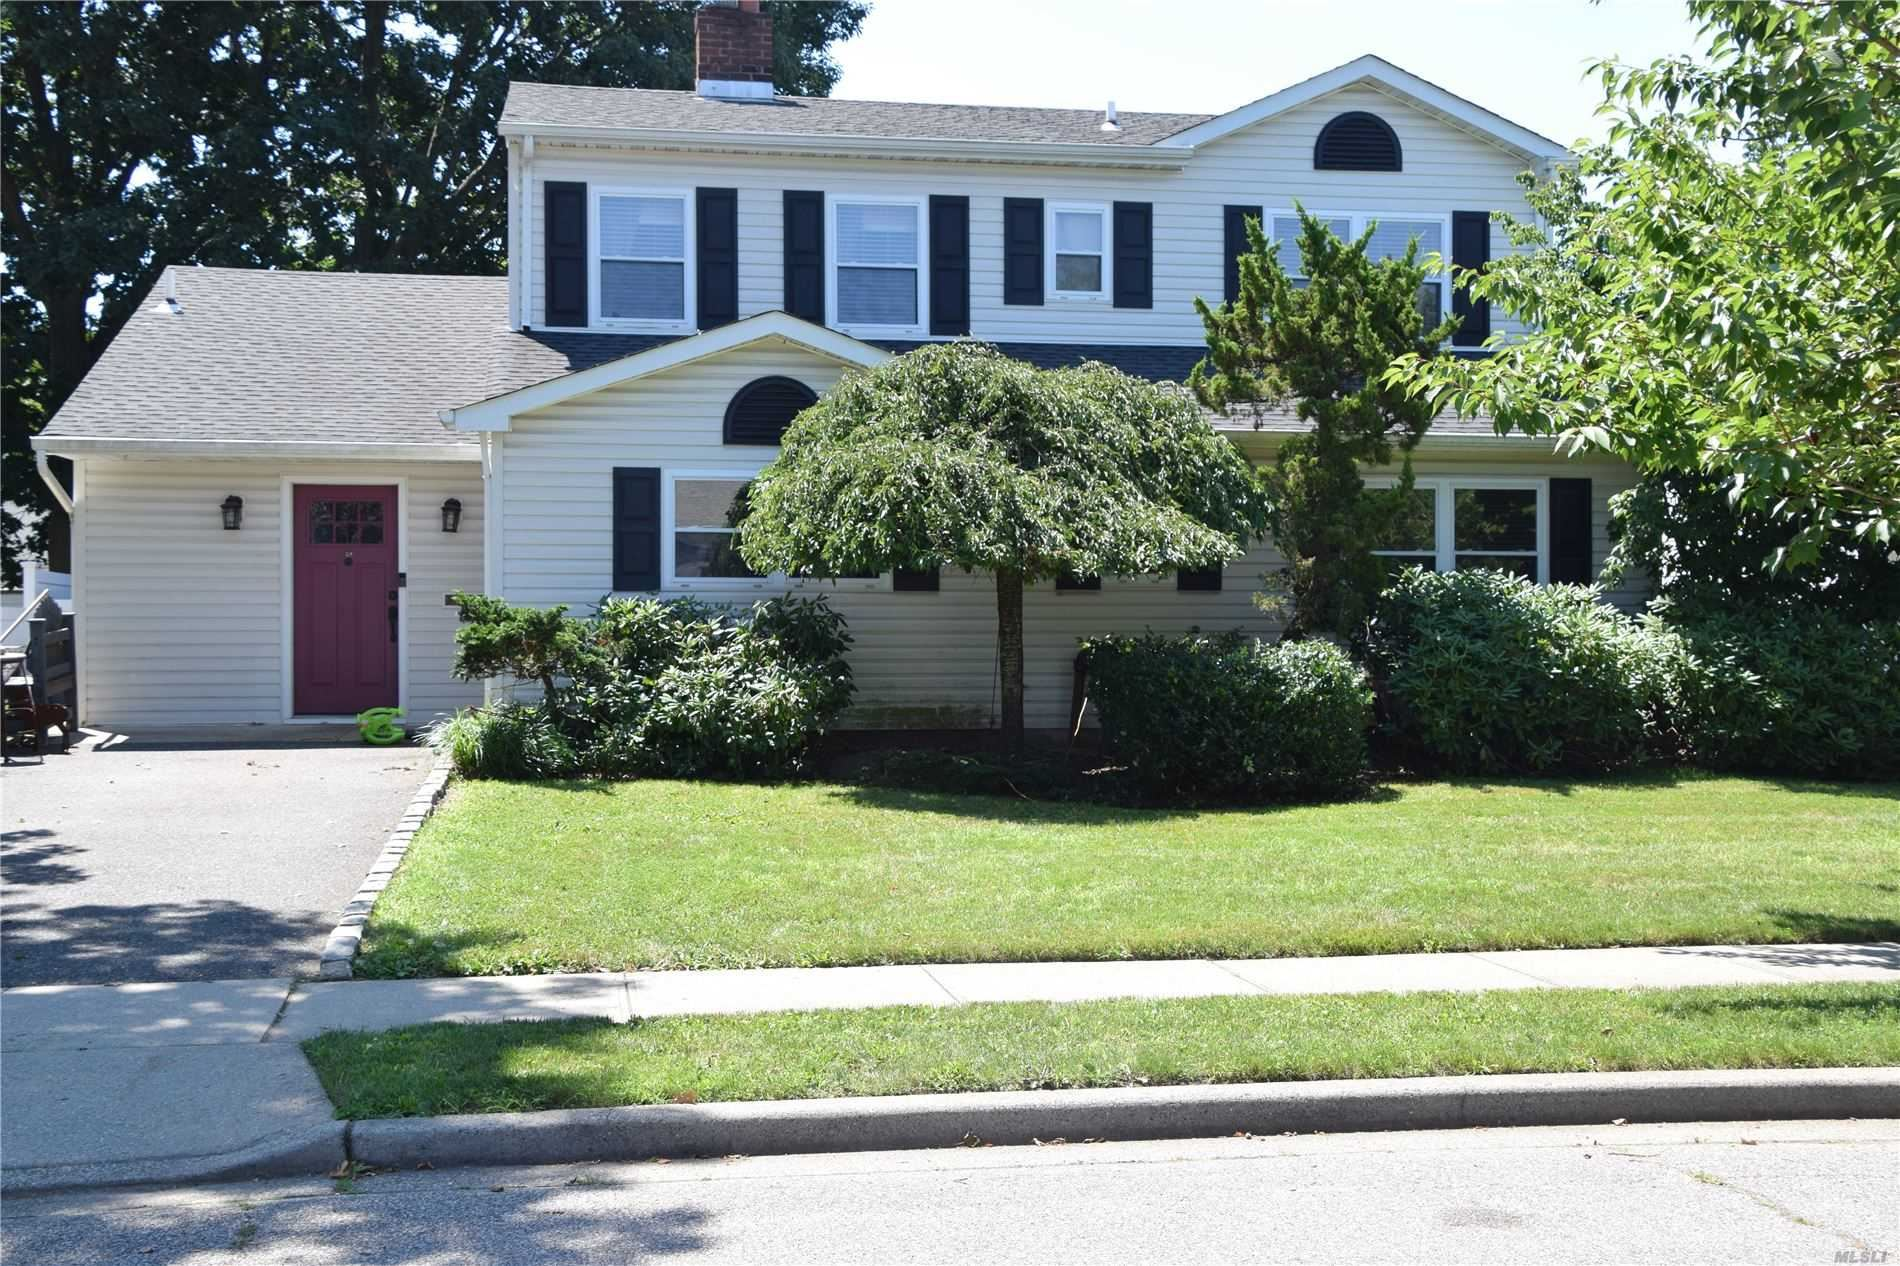 125 Acre Lane, Hicksville, NY 11801 - MLS#: 3232530